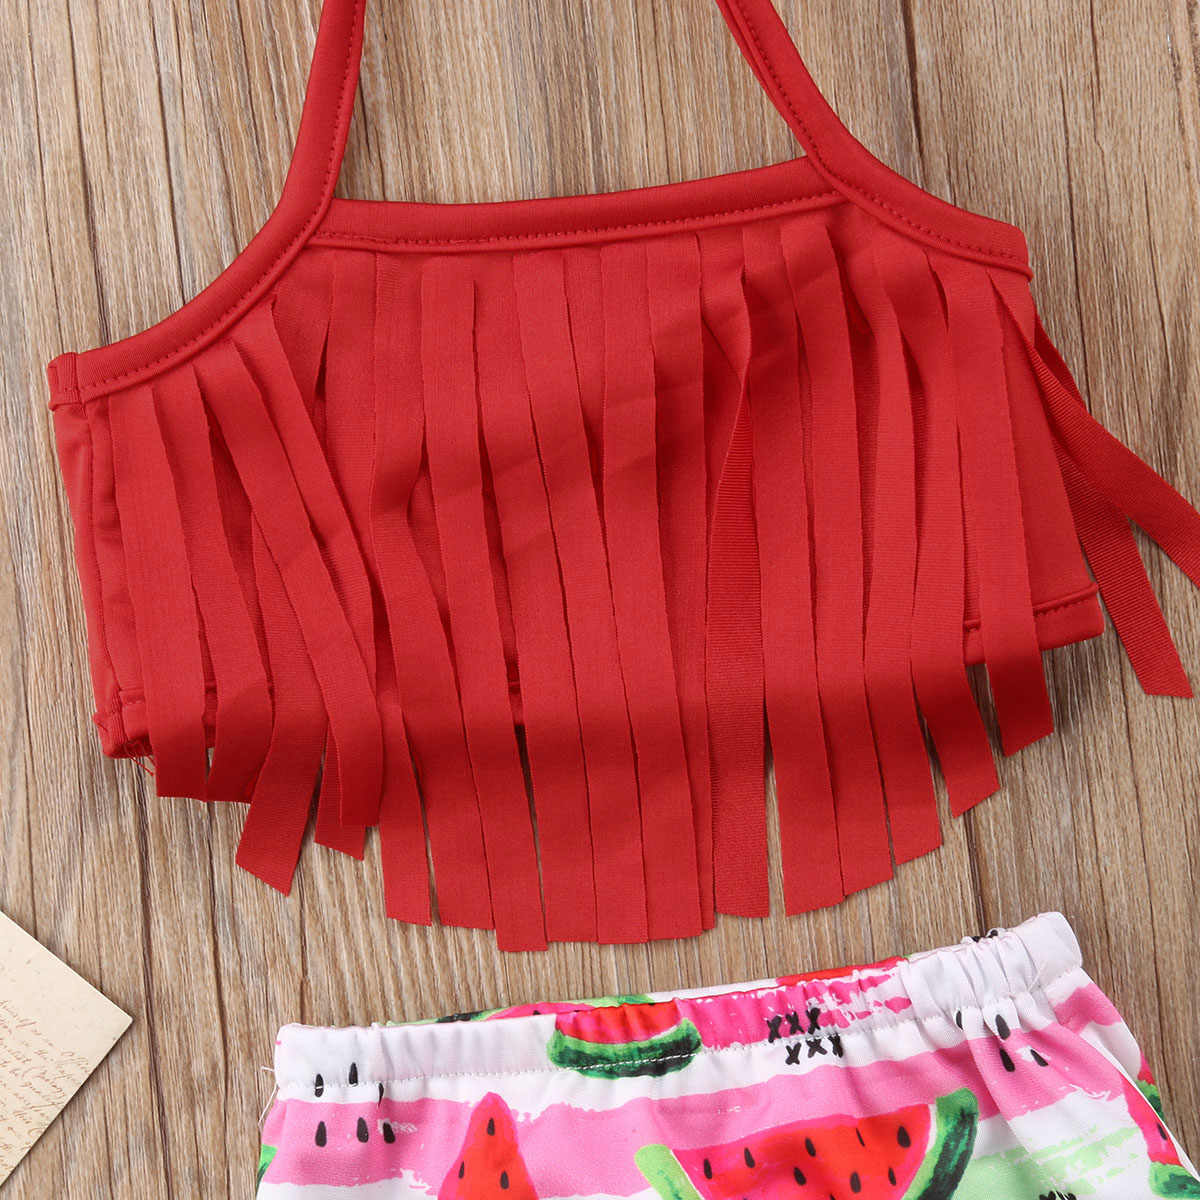 Rumbai Anak-anak Balita Bayi Gadis Semangka Bikini Set Buah Pakaian Renang Baju Renang Baju Renang